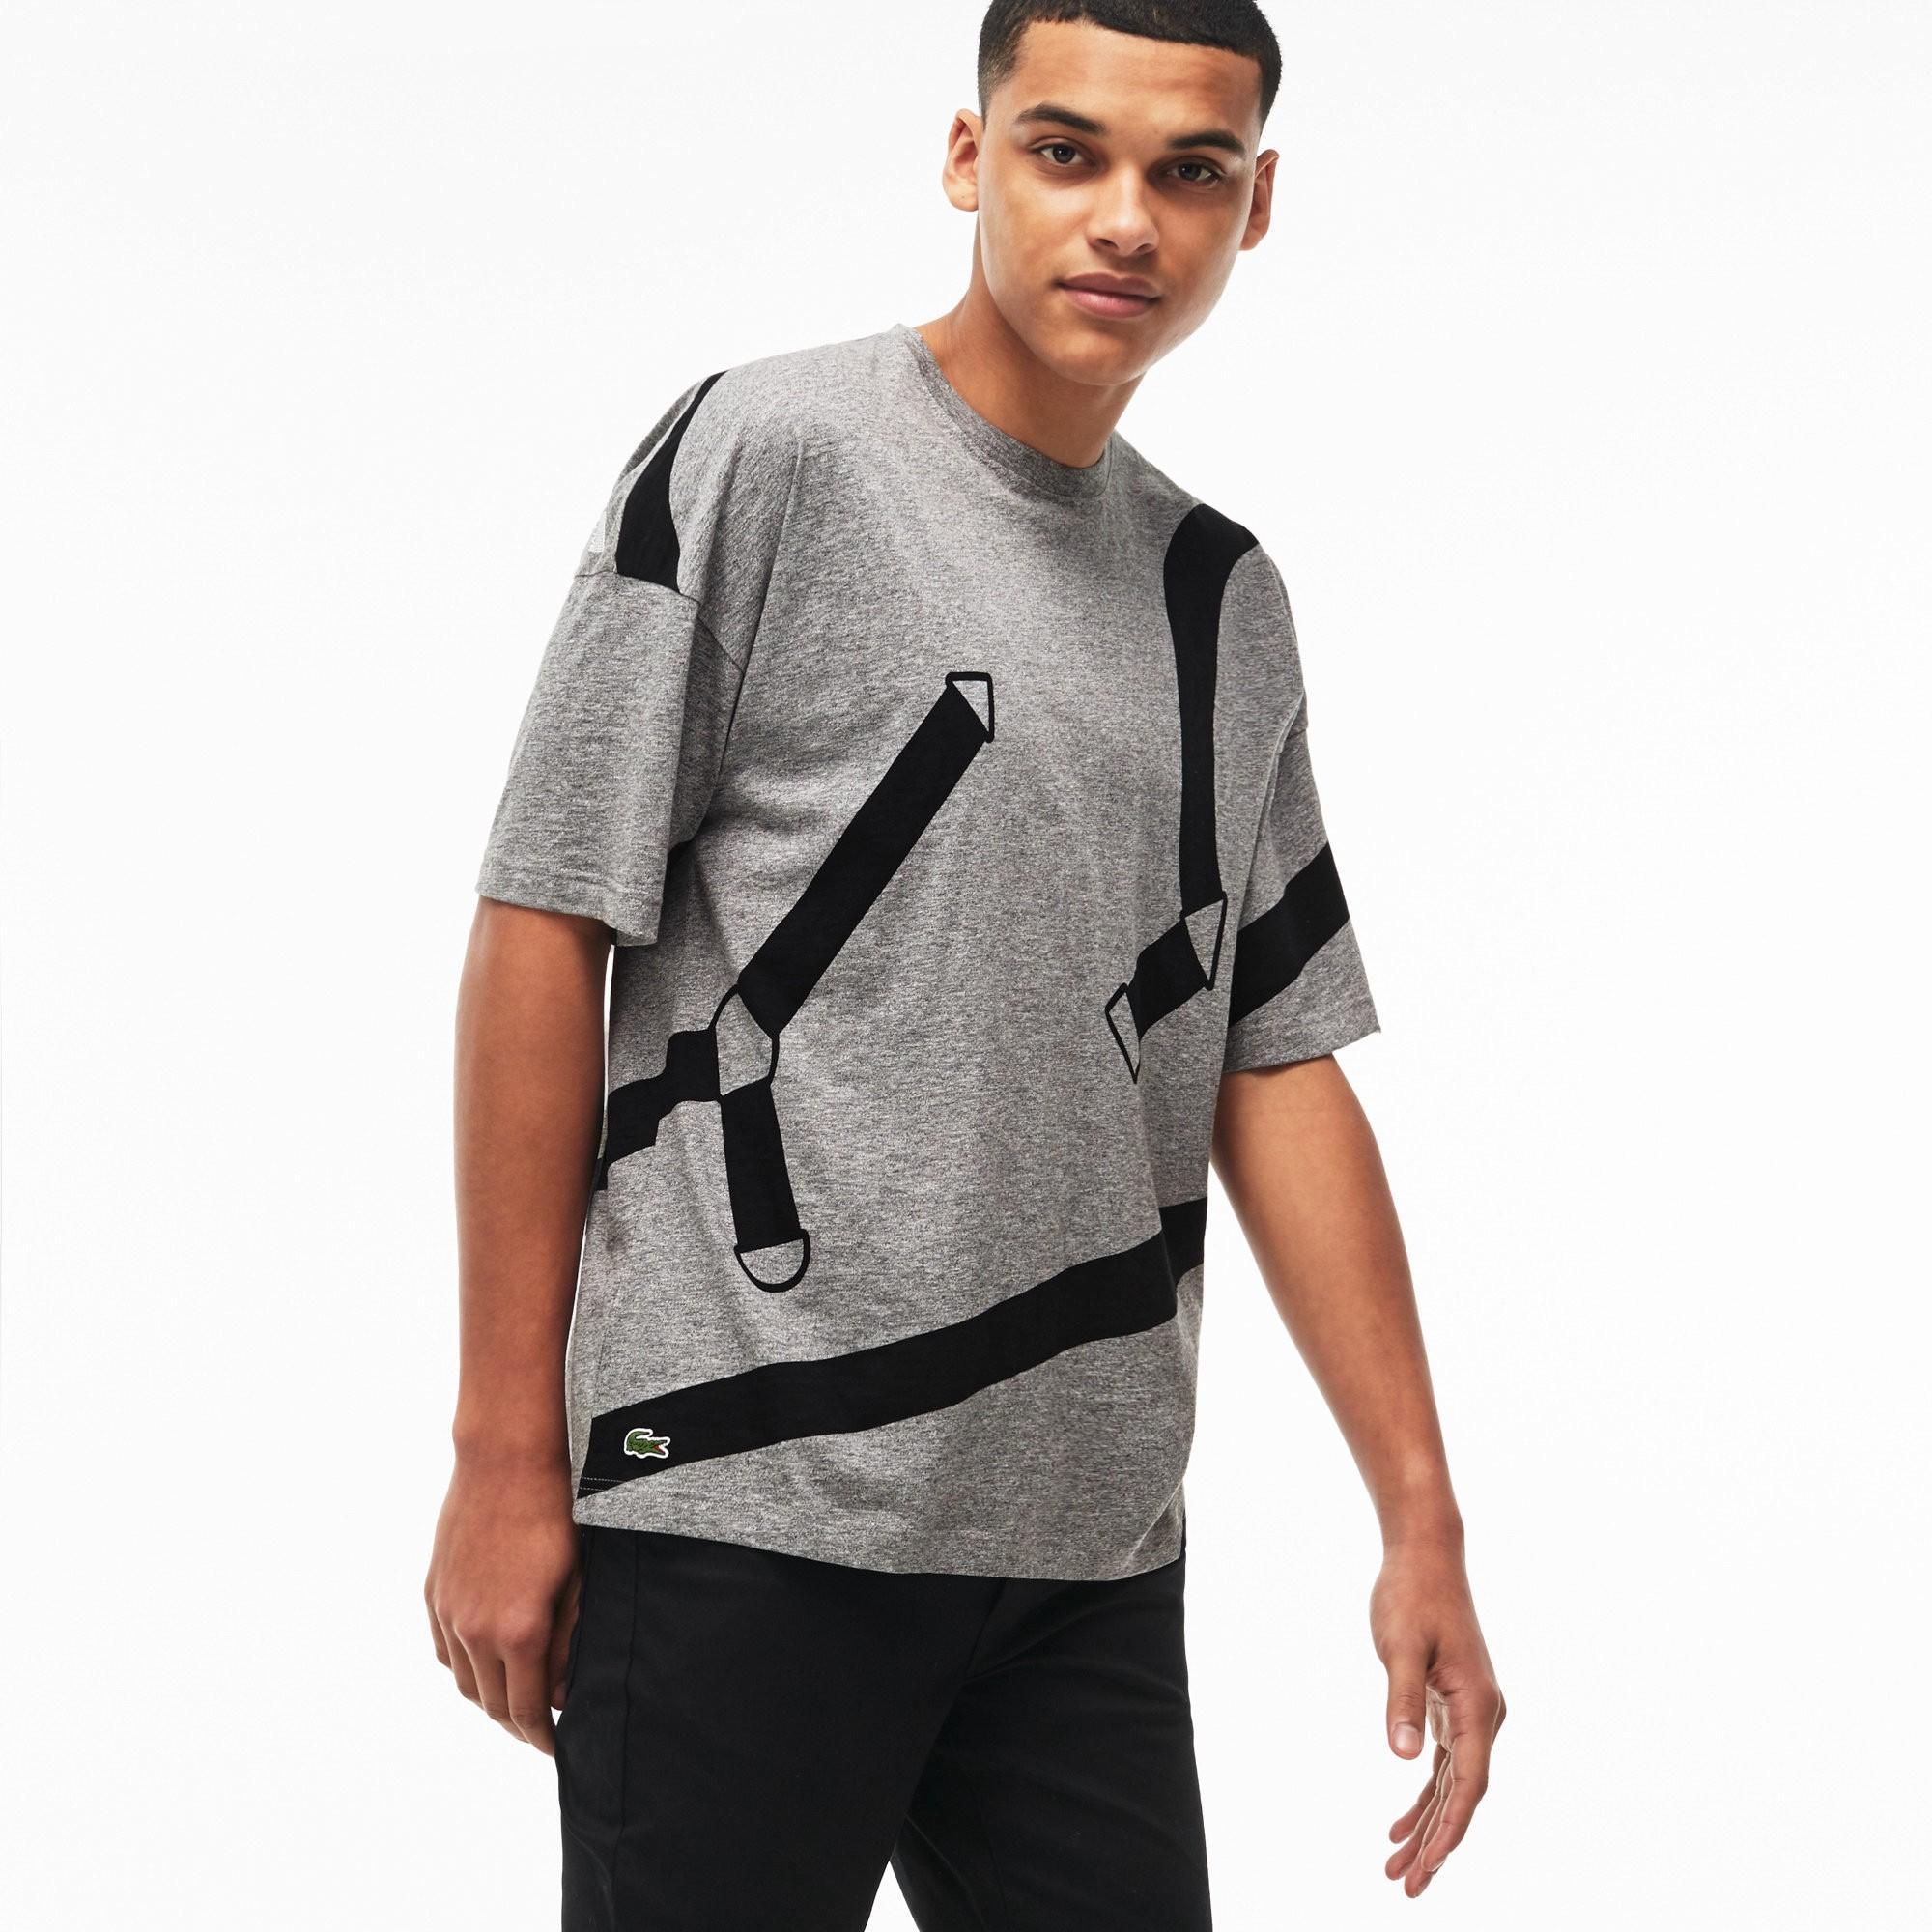 408416c092 Men's Live Crew Neck Graphic Print Cotton Jersey T-Shirt in Grey / Black